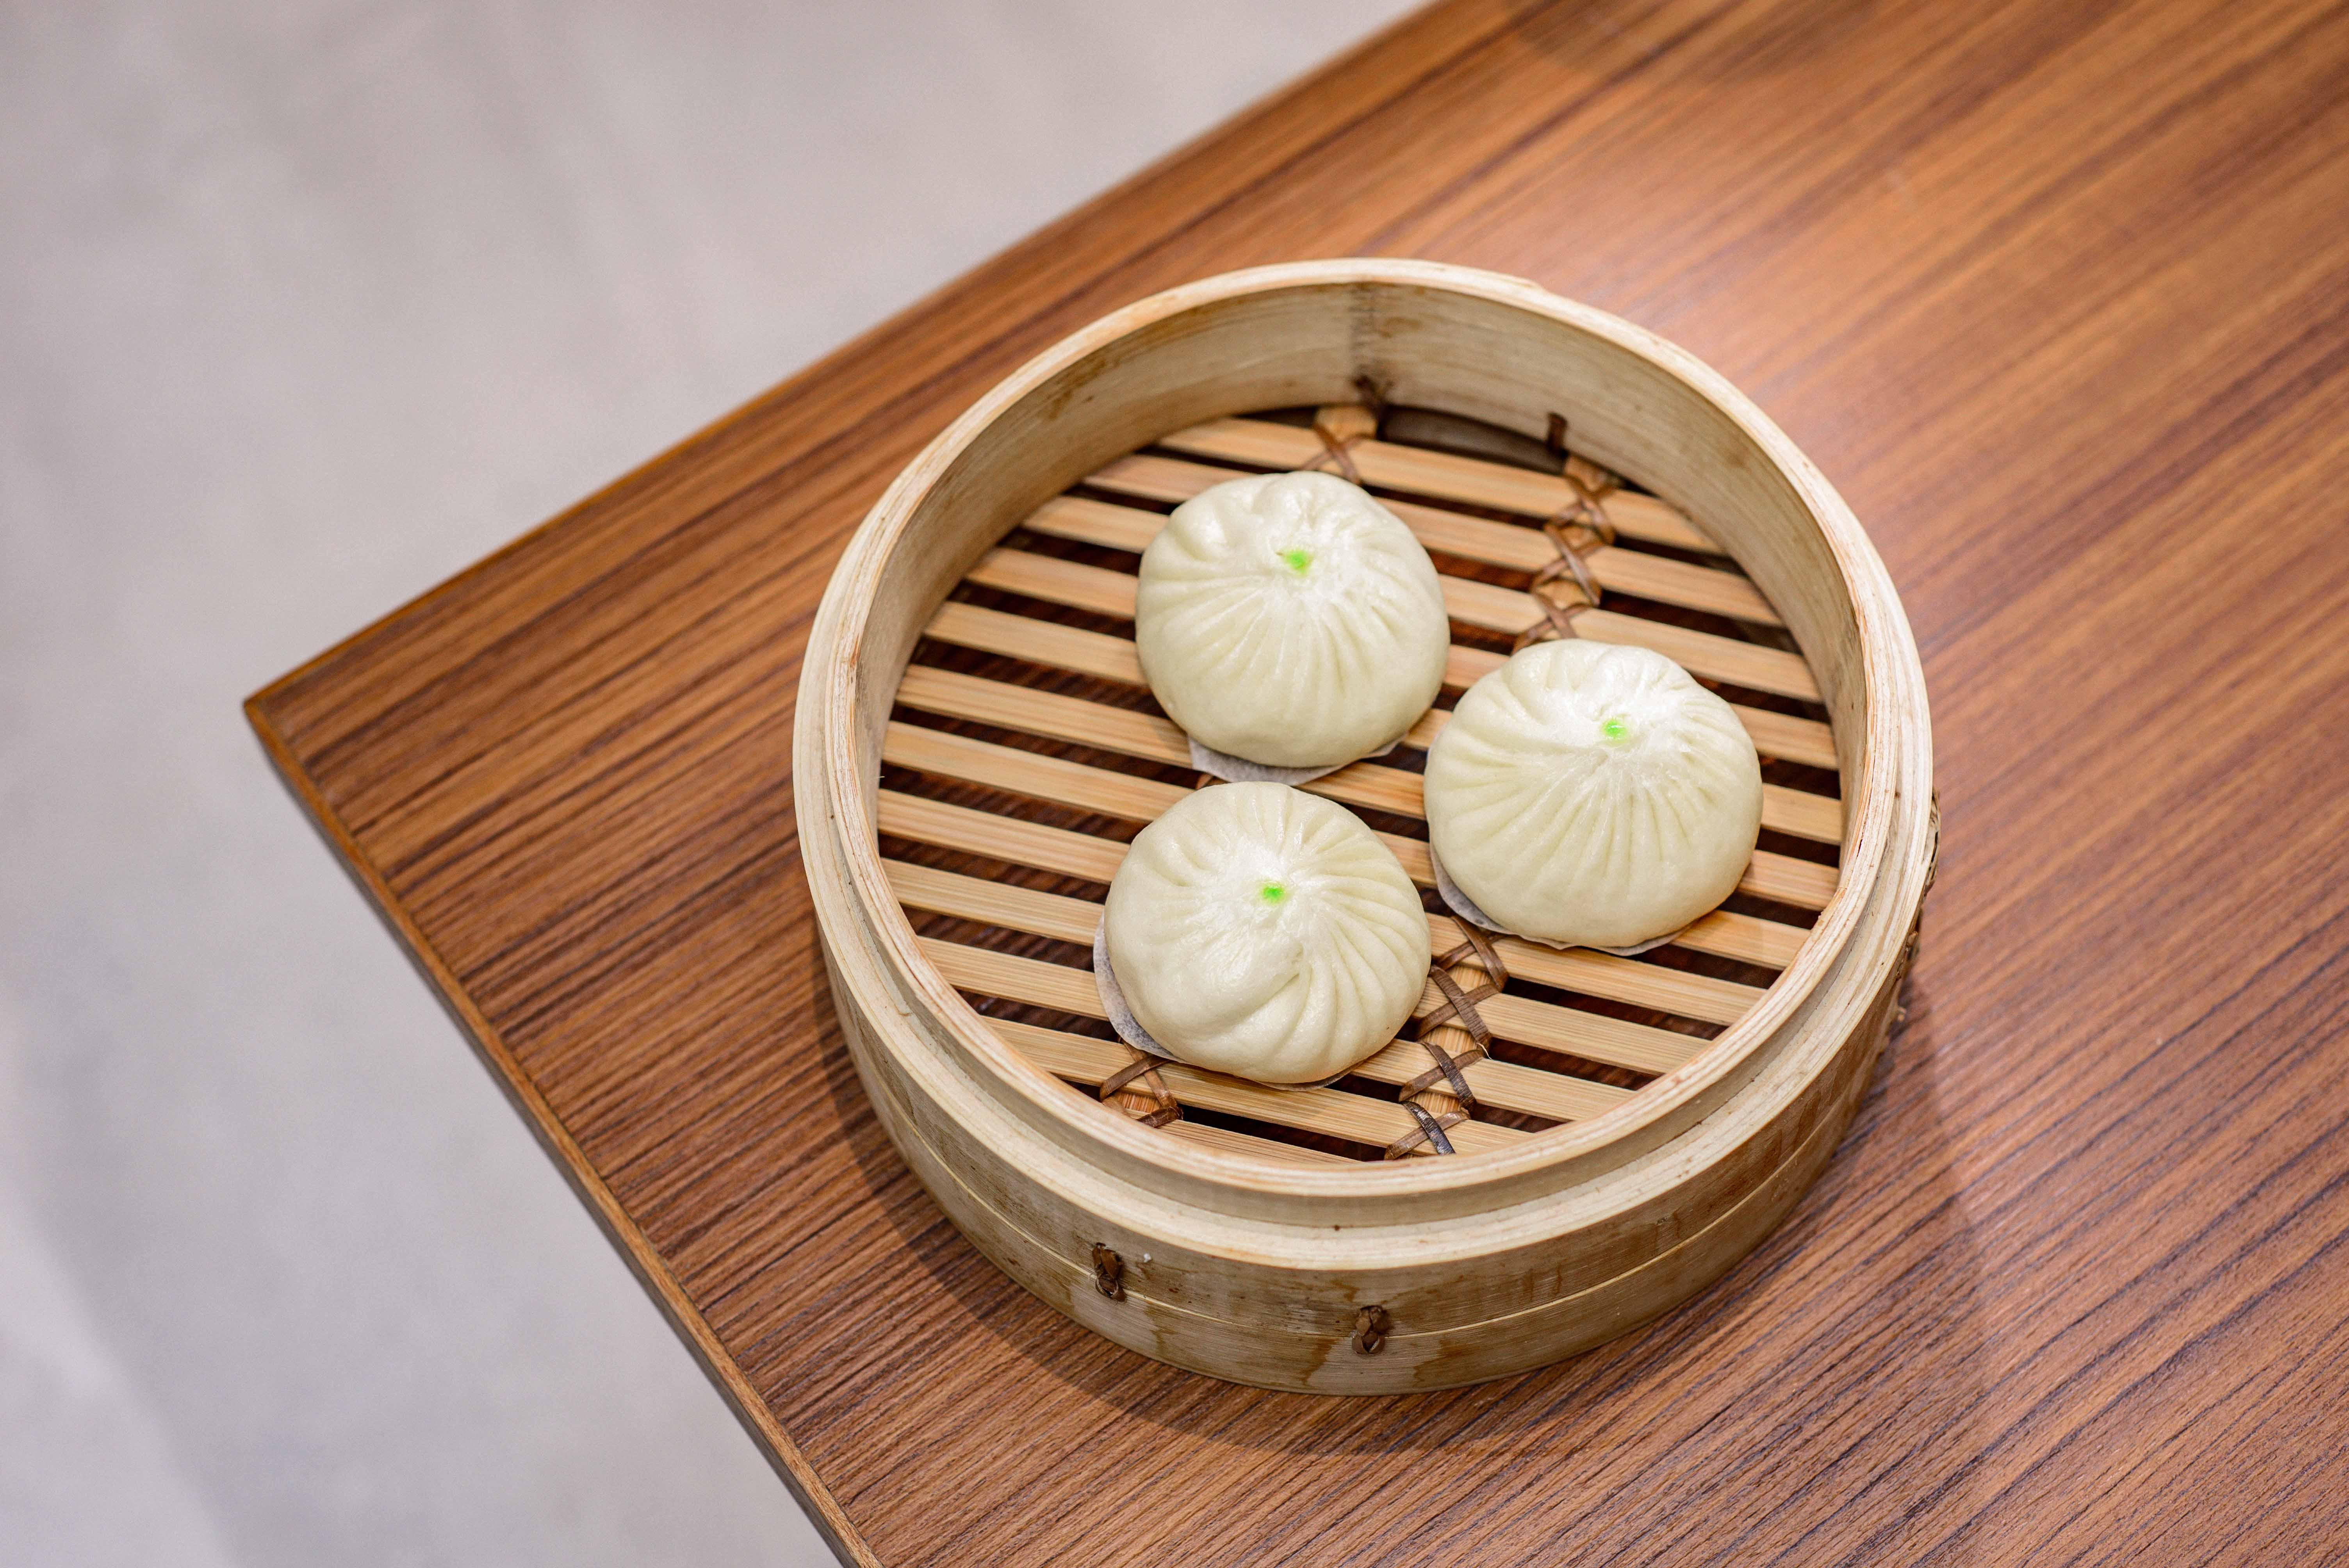 Xiaolongbao dumplings on the menu at Din Tai Fung's first London restaurant opening